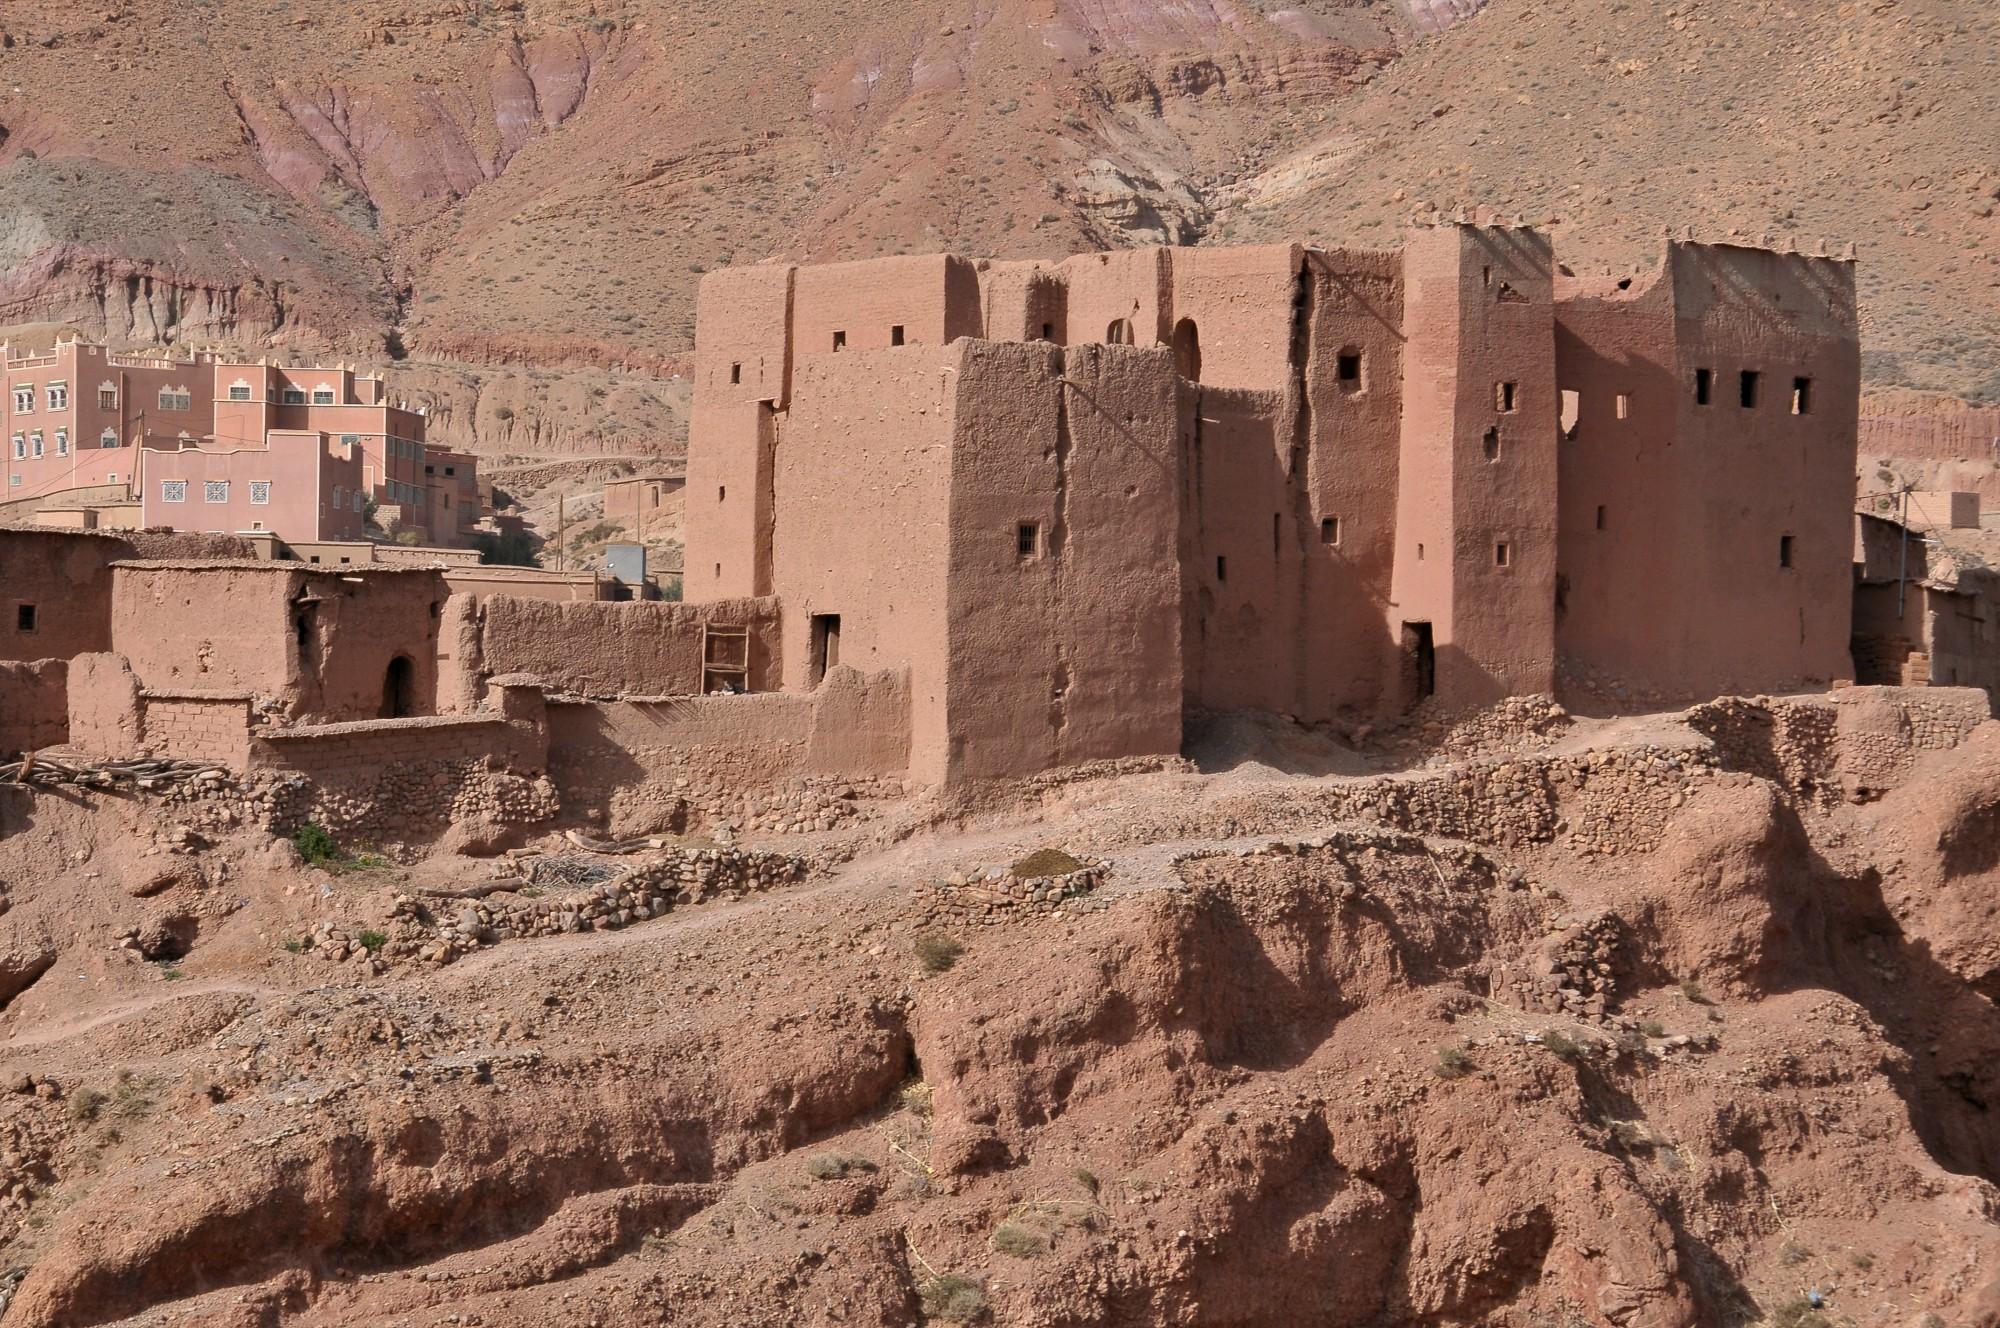 Marruecos-kasbahs-18